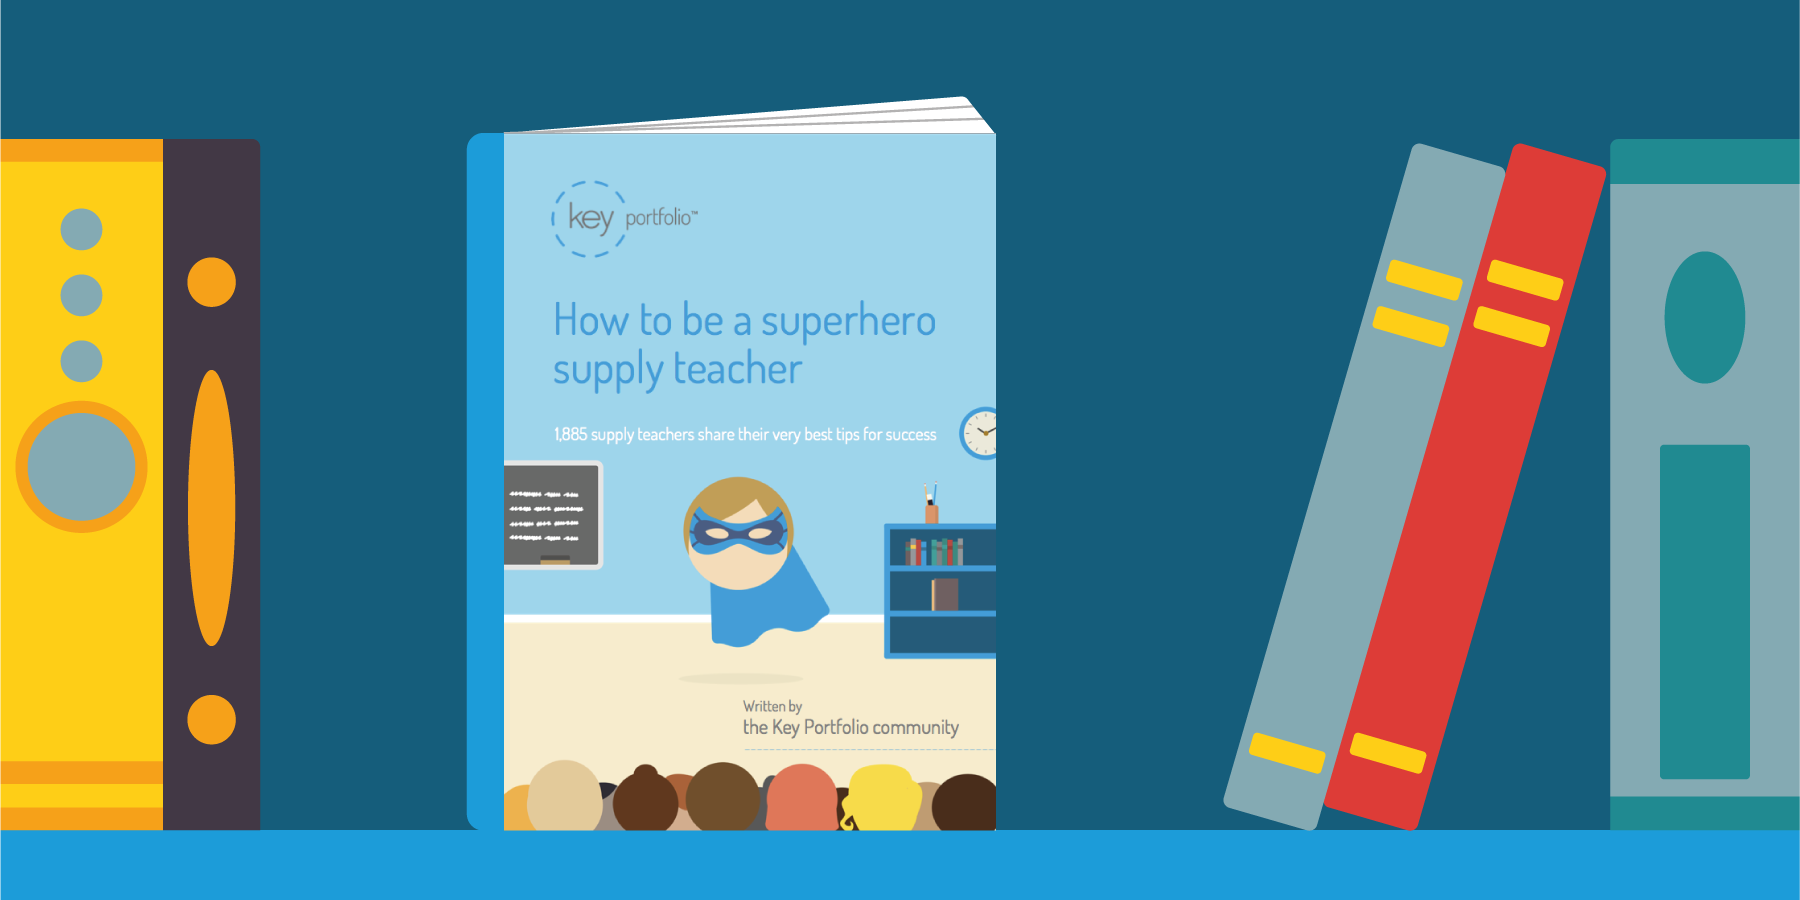 How to be a superhero supply teacher book